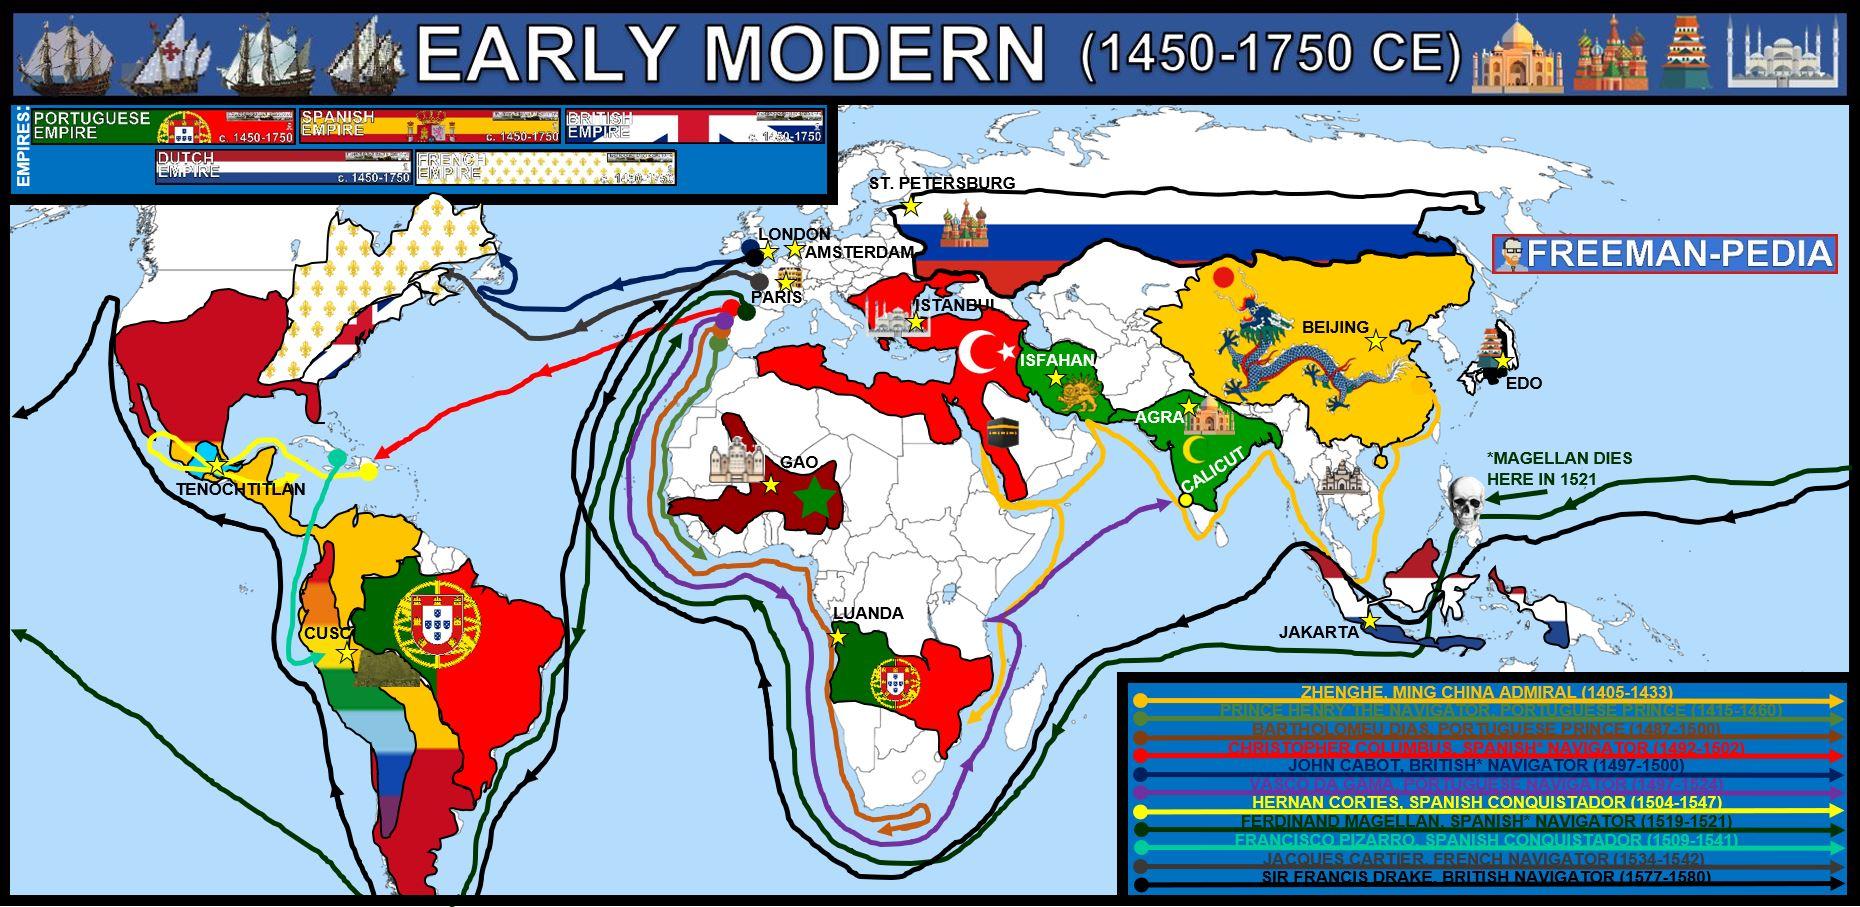 EARLY MODERN MAP AP WORLD HISTORY MODERN FREEMANPEDIA.JPG